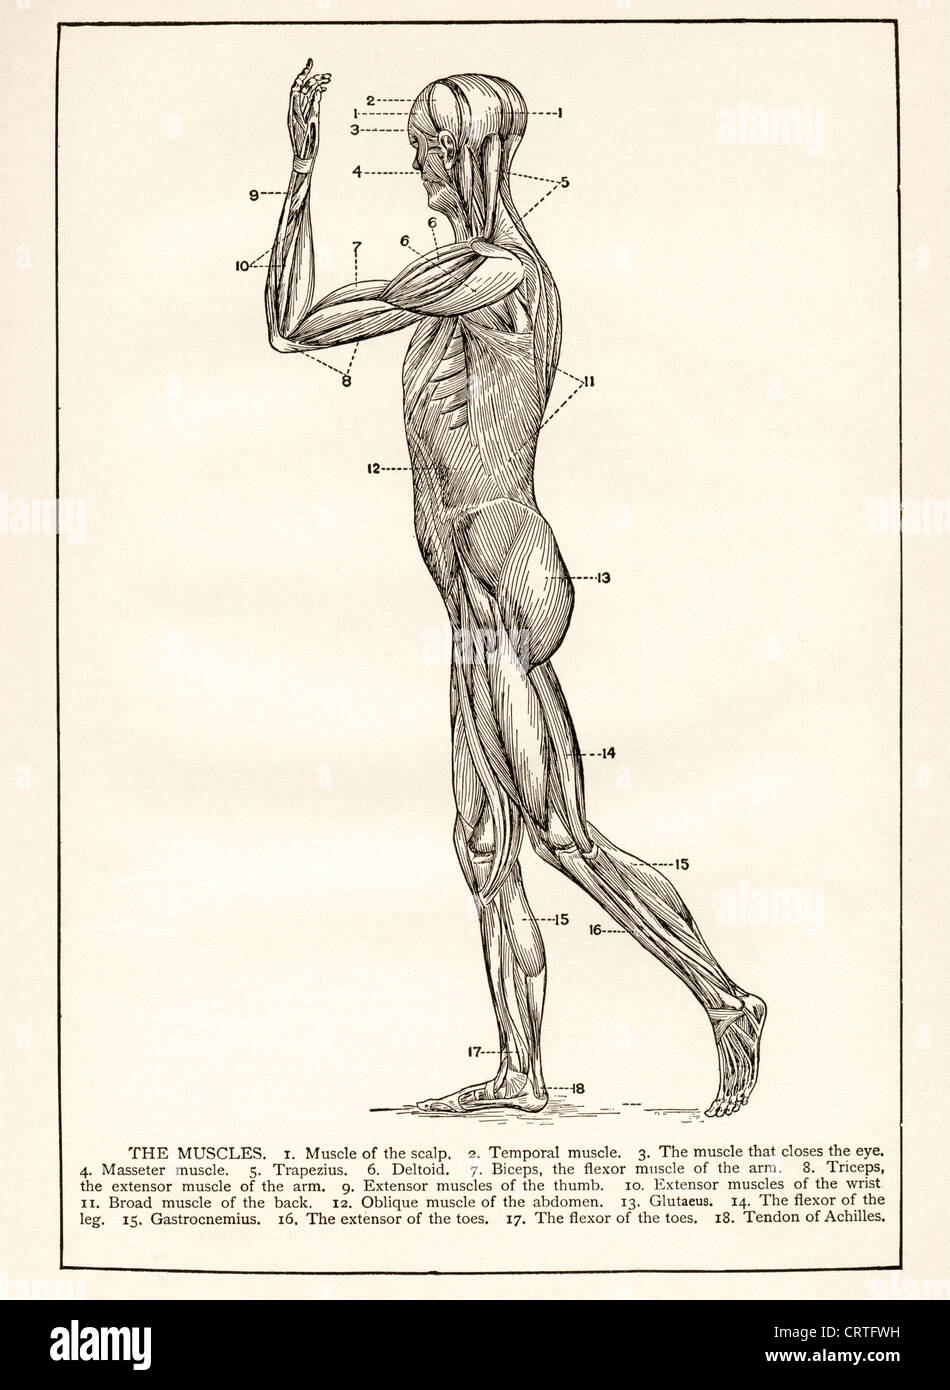 Biceps Tendon Stock Photos & Biceps Tendon Stock Images - Alamy